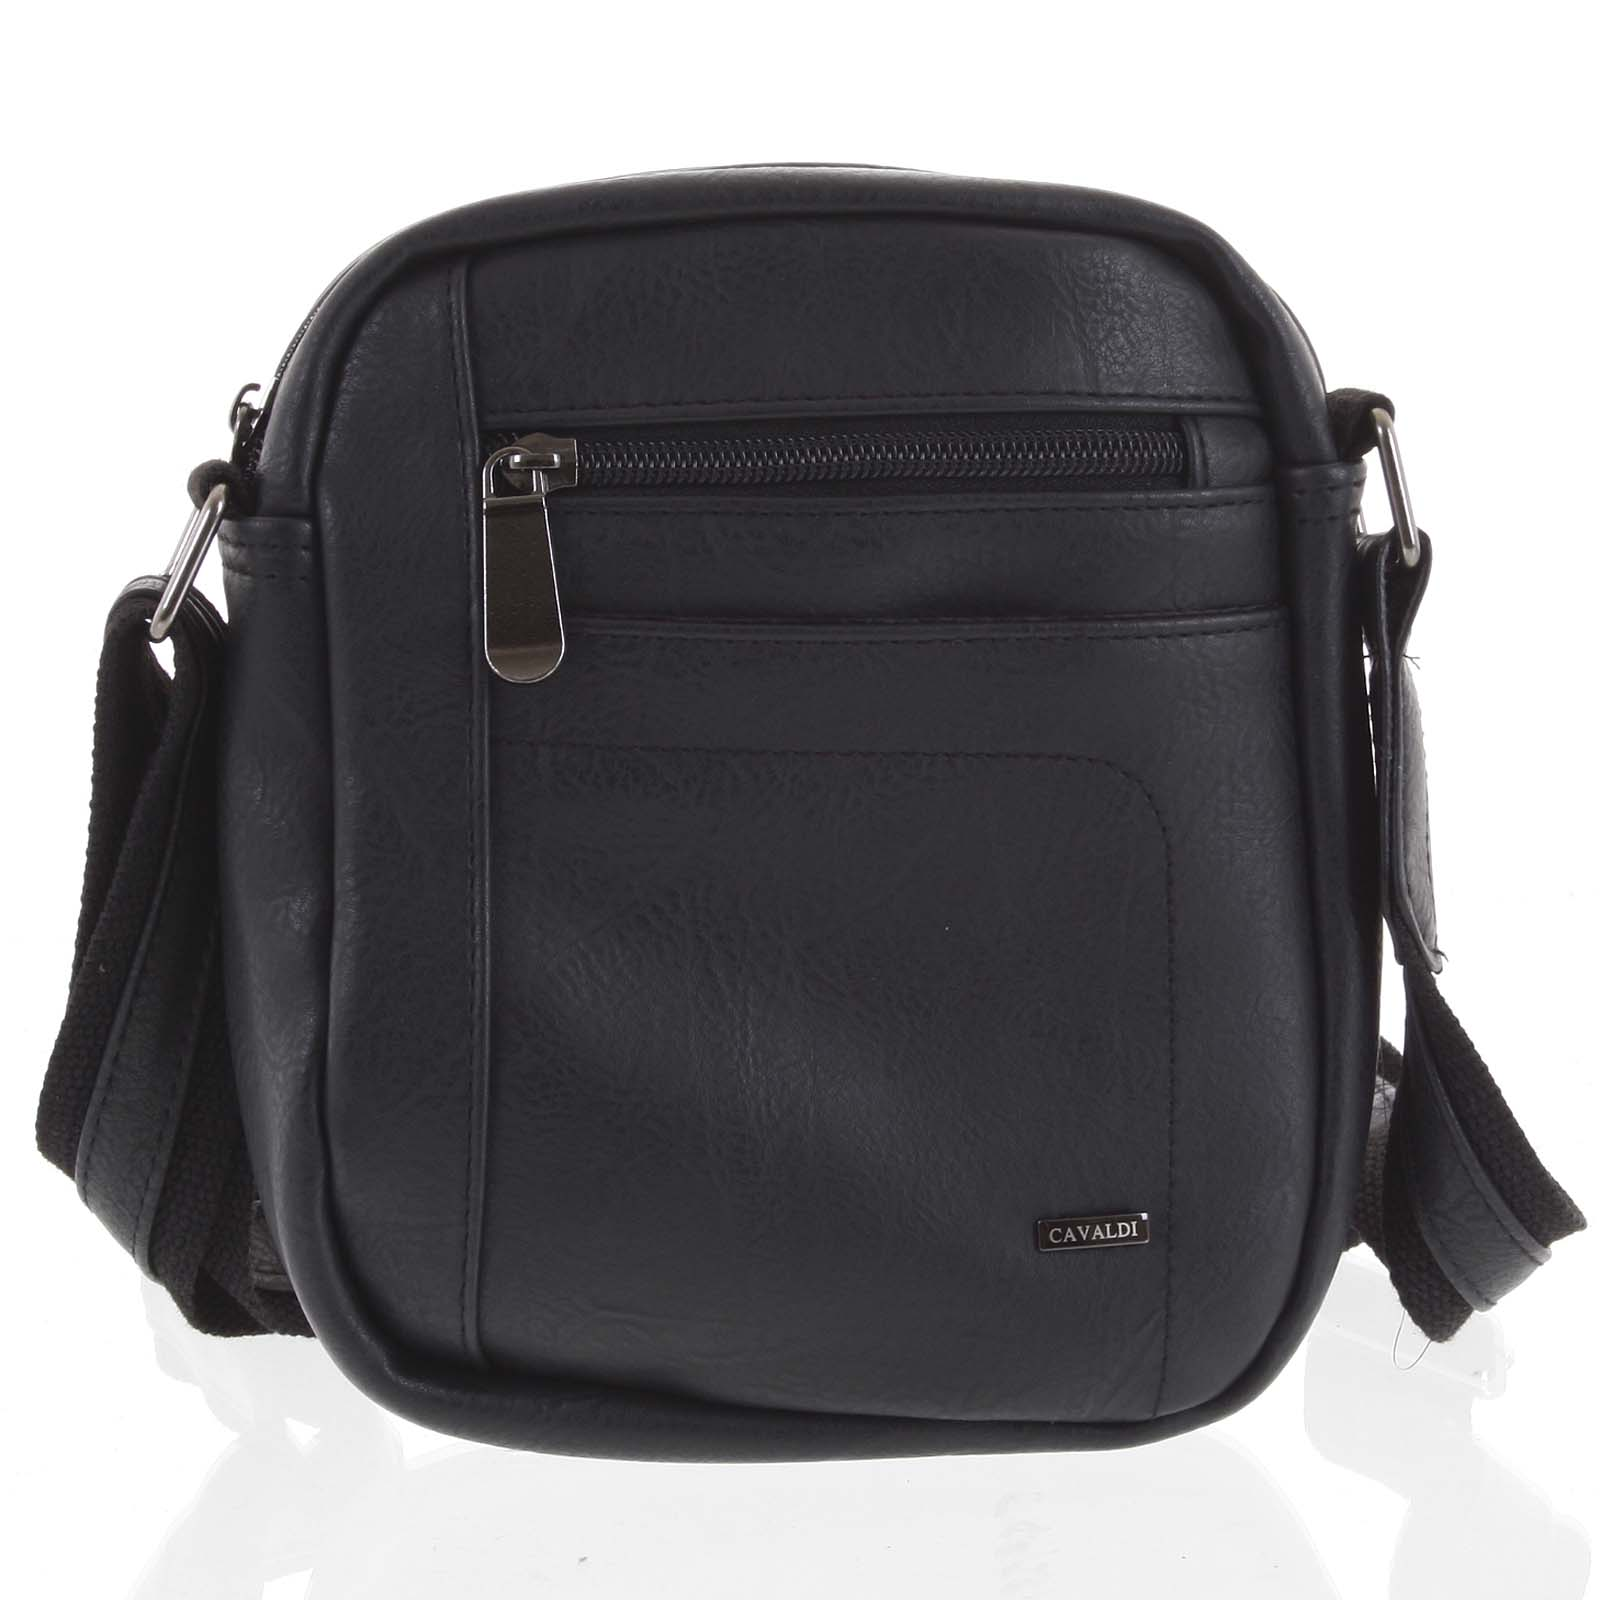 Pánská taška na doklady černá - Cavaldi 8022